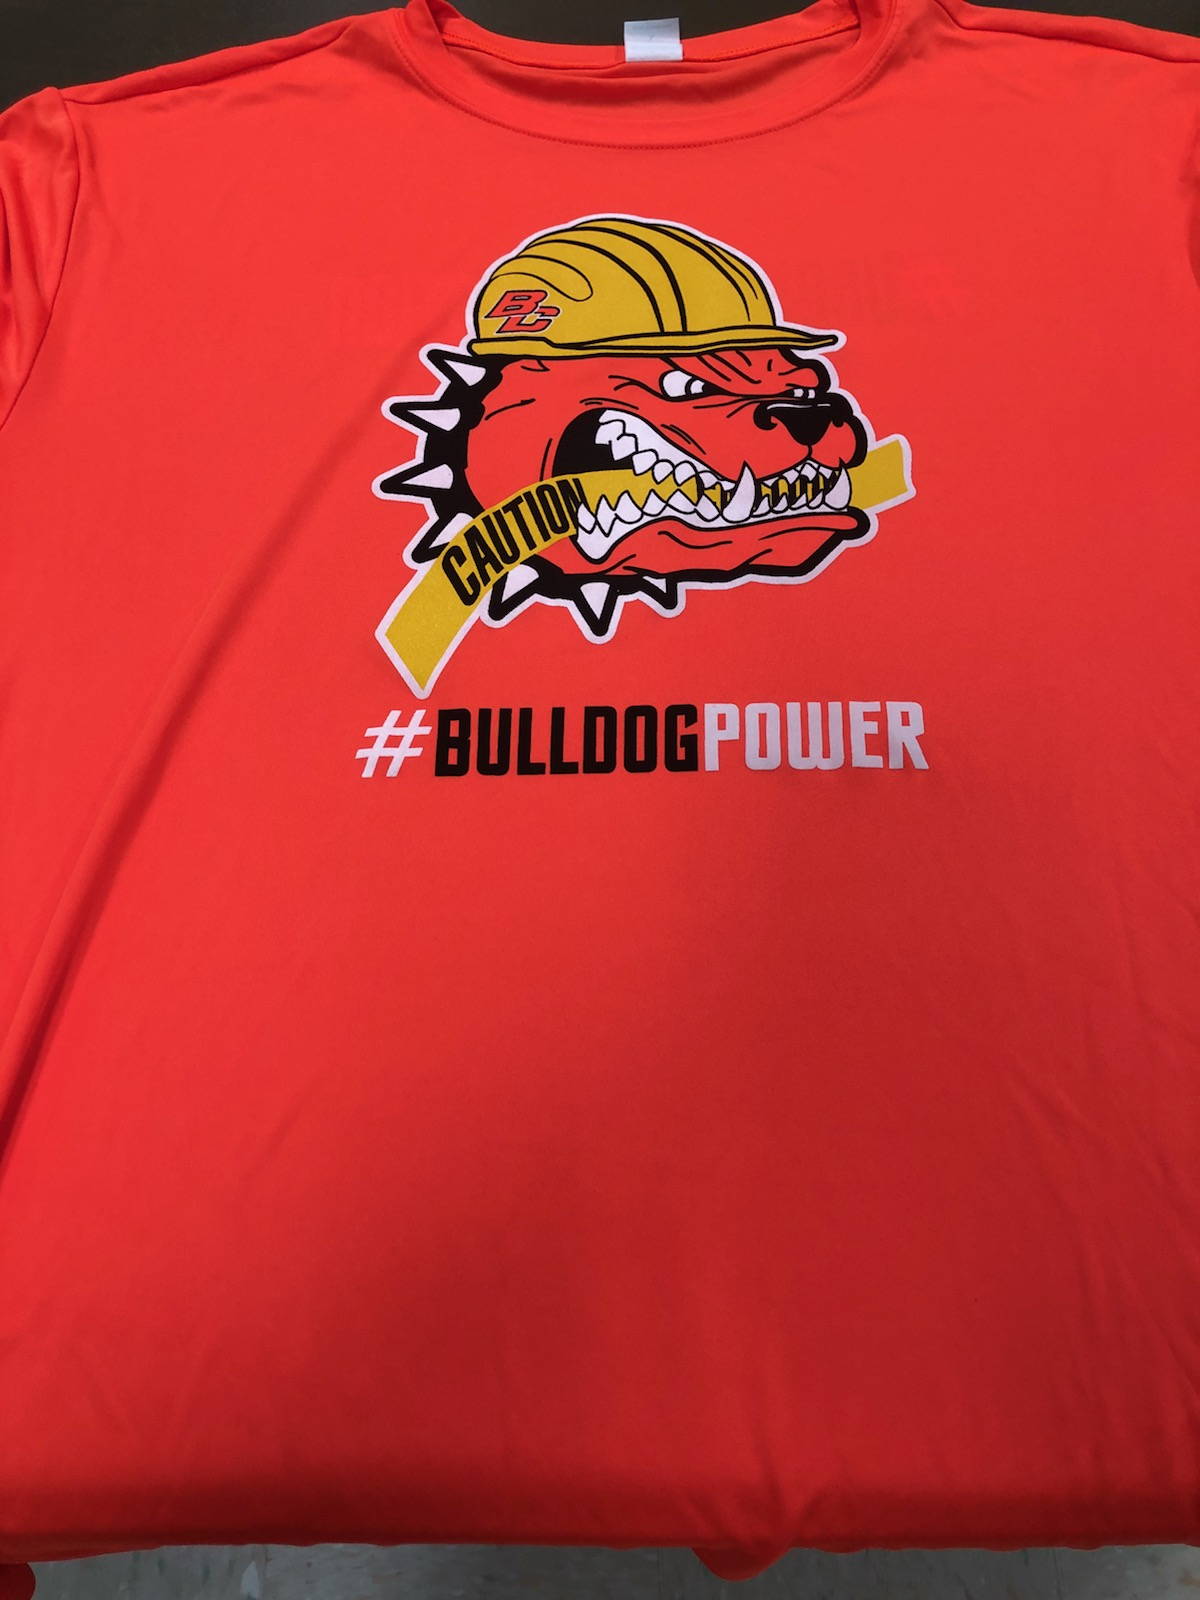 Neon #BulldogPower Shirt Blowout!